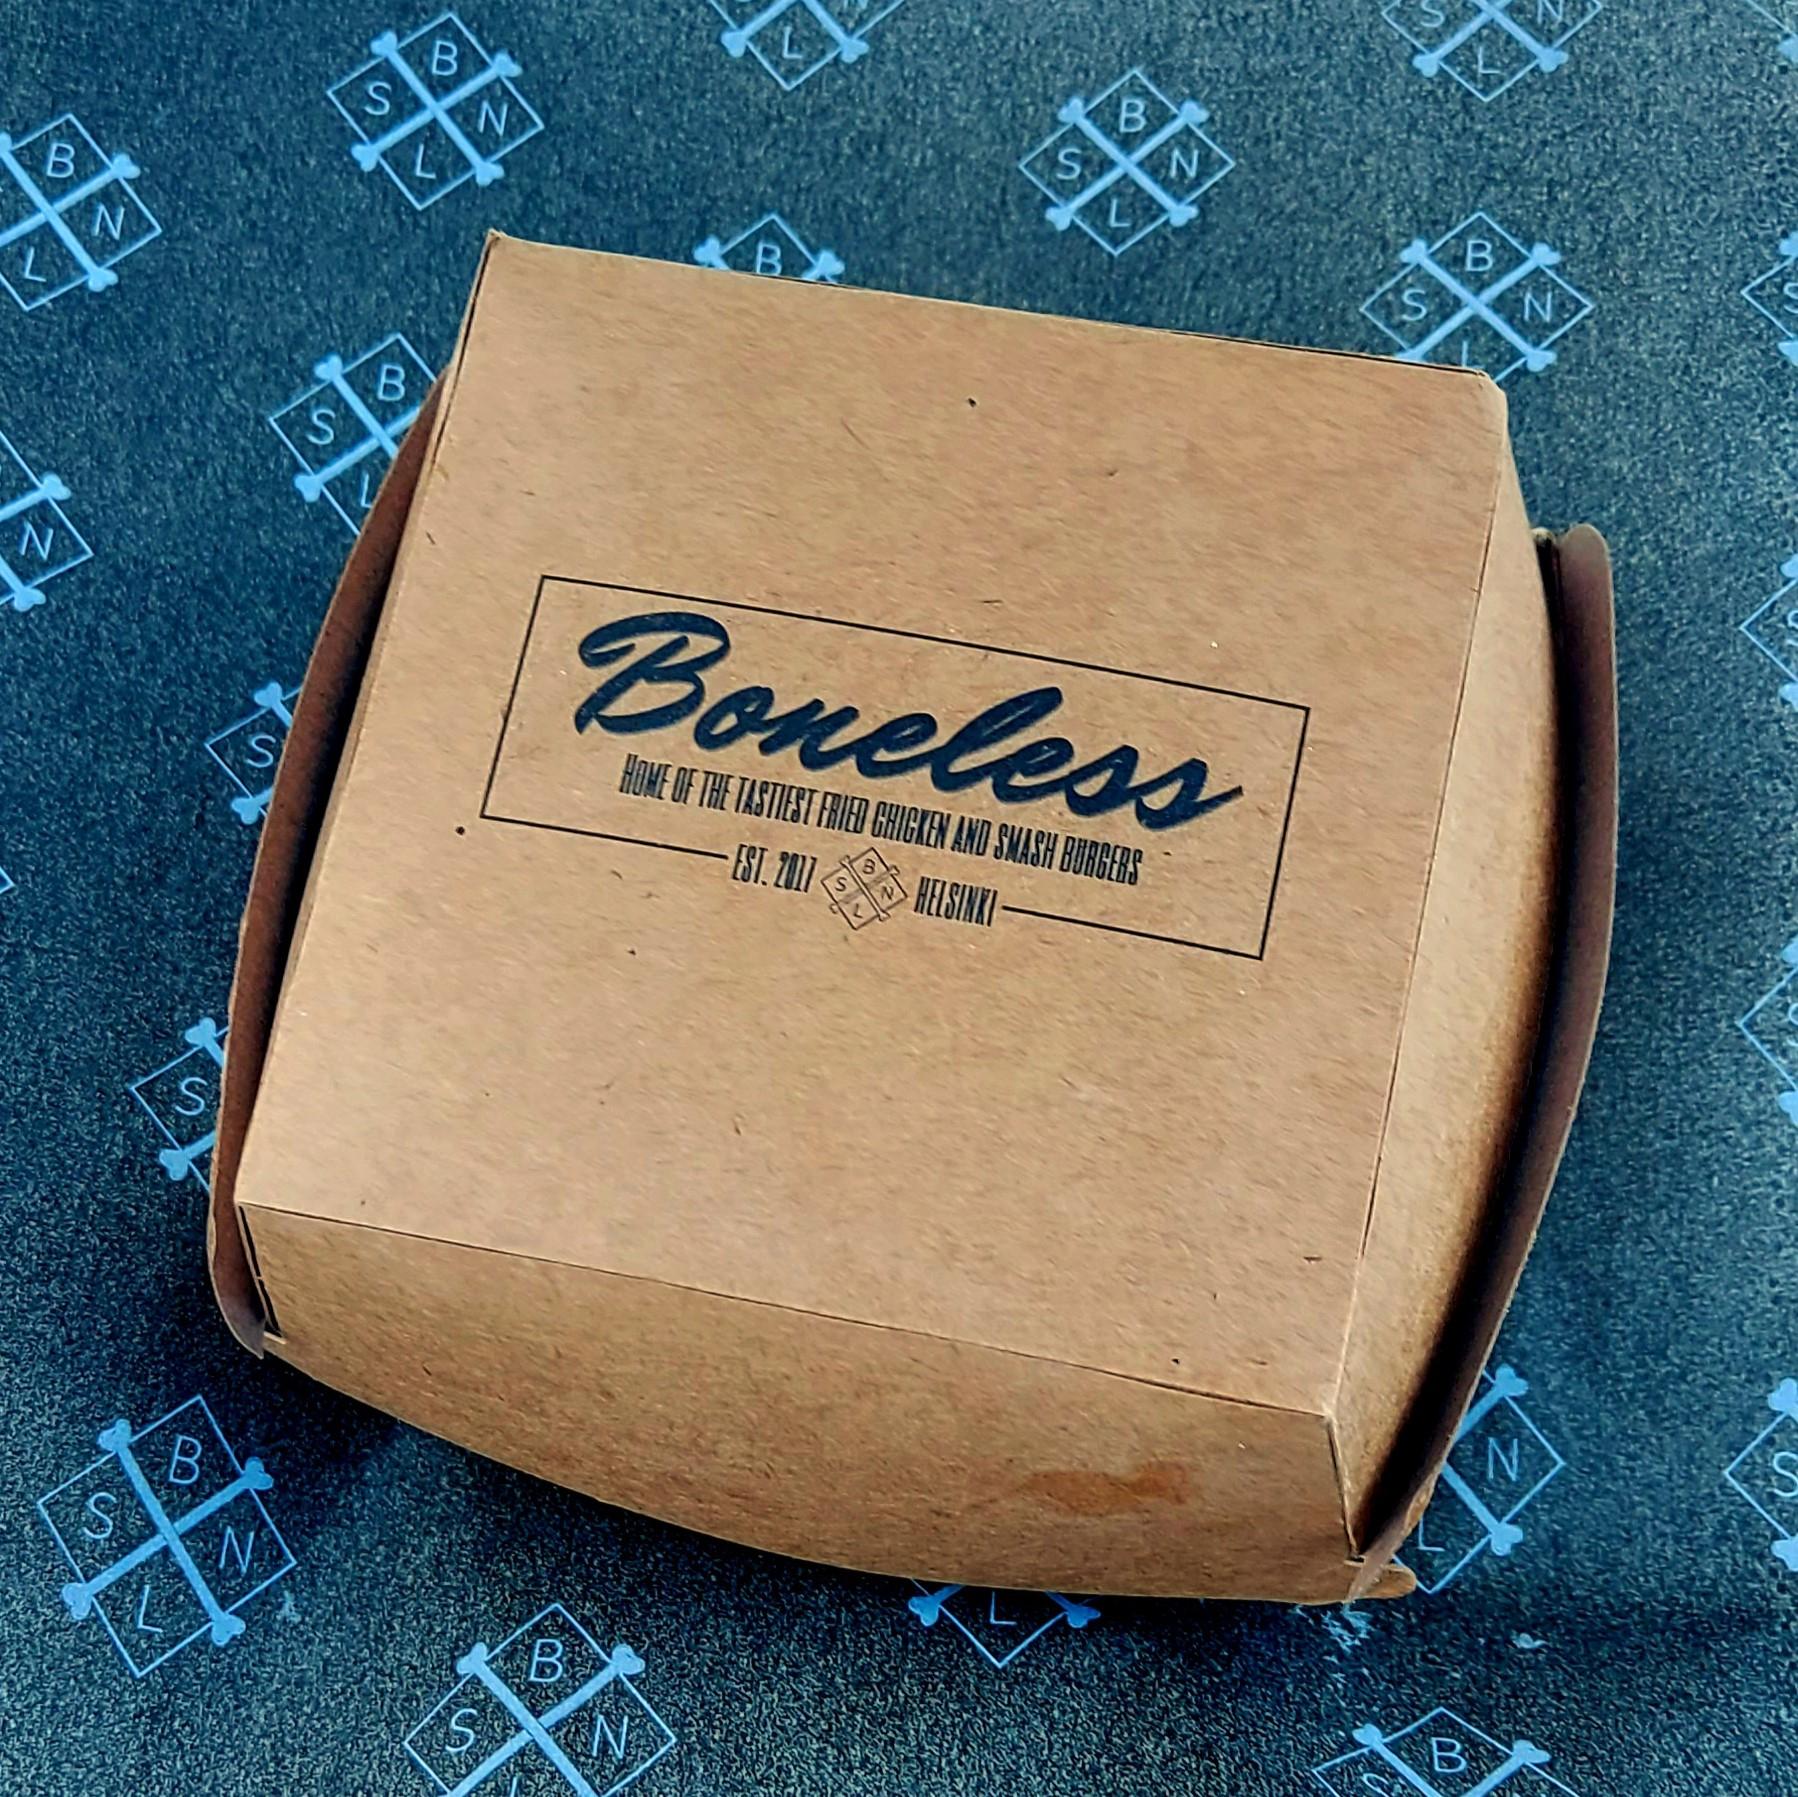 Boneless restaurants logoprinted burger box and wrapper